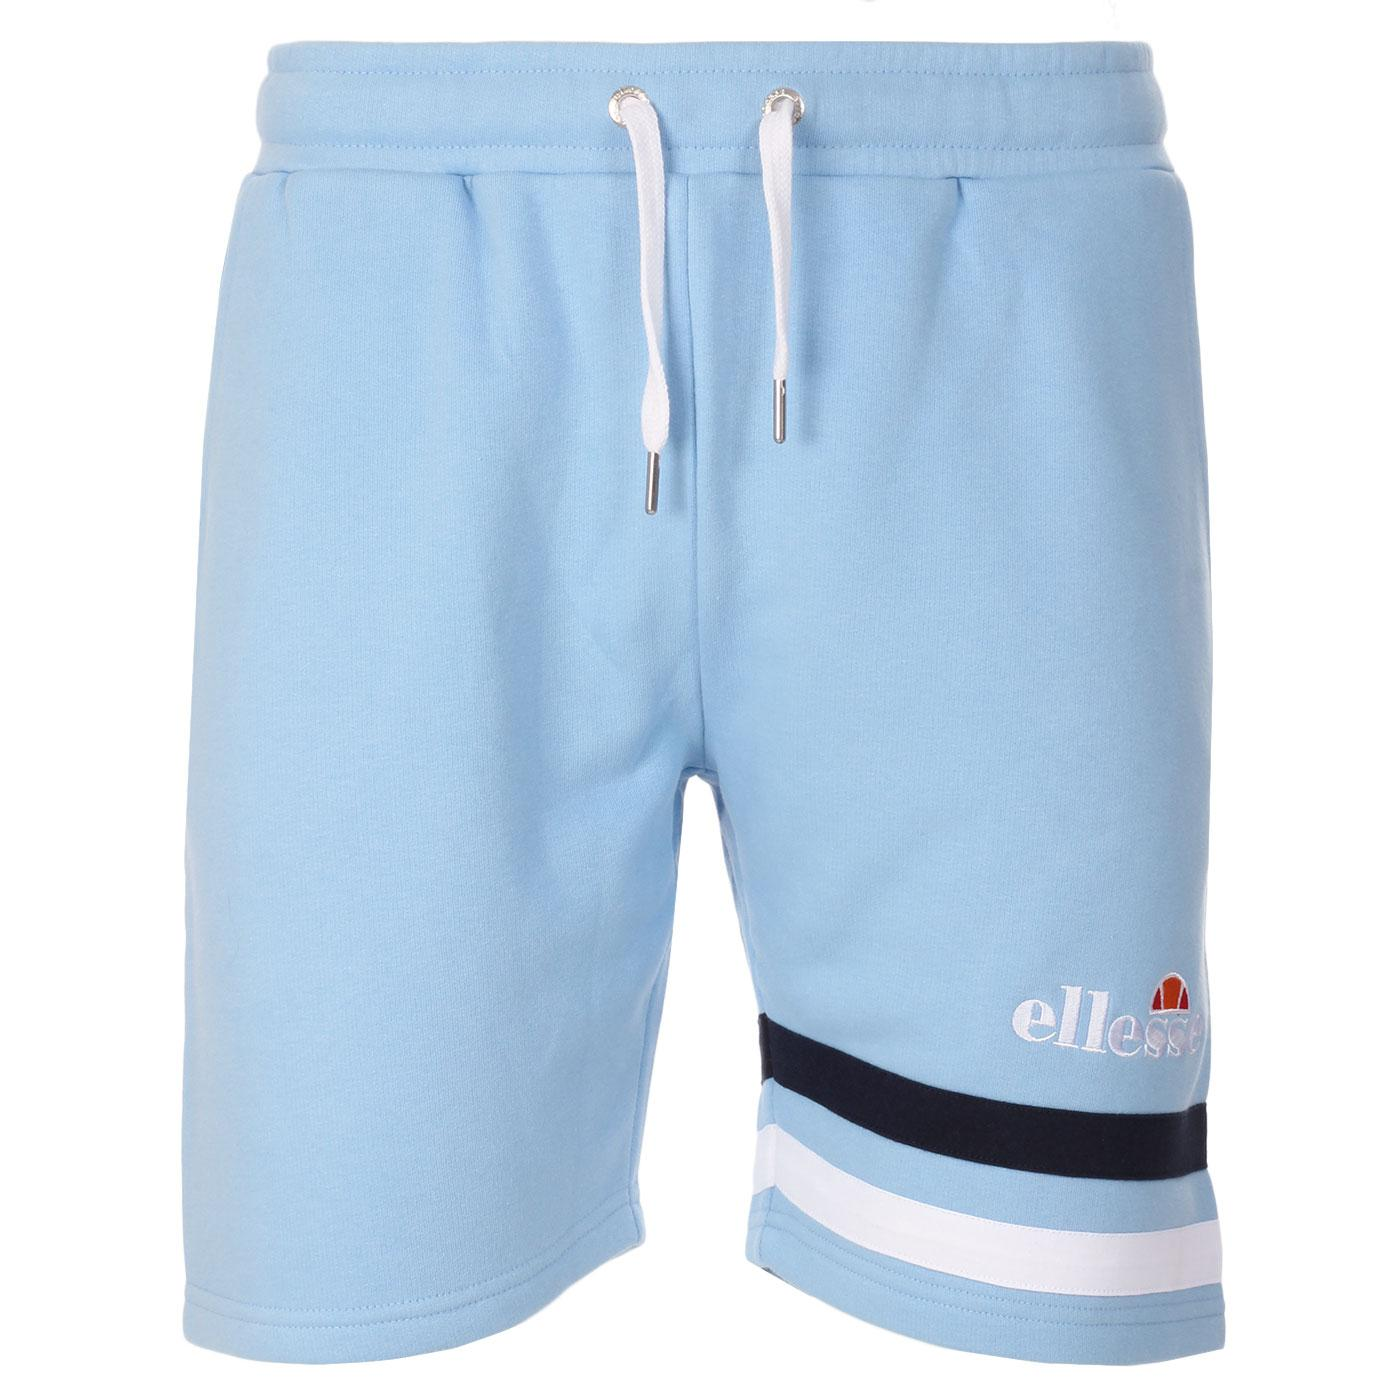 Tognazza ELLESSE Retro 90s Stripe Shorts (LB)